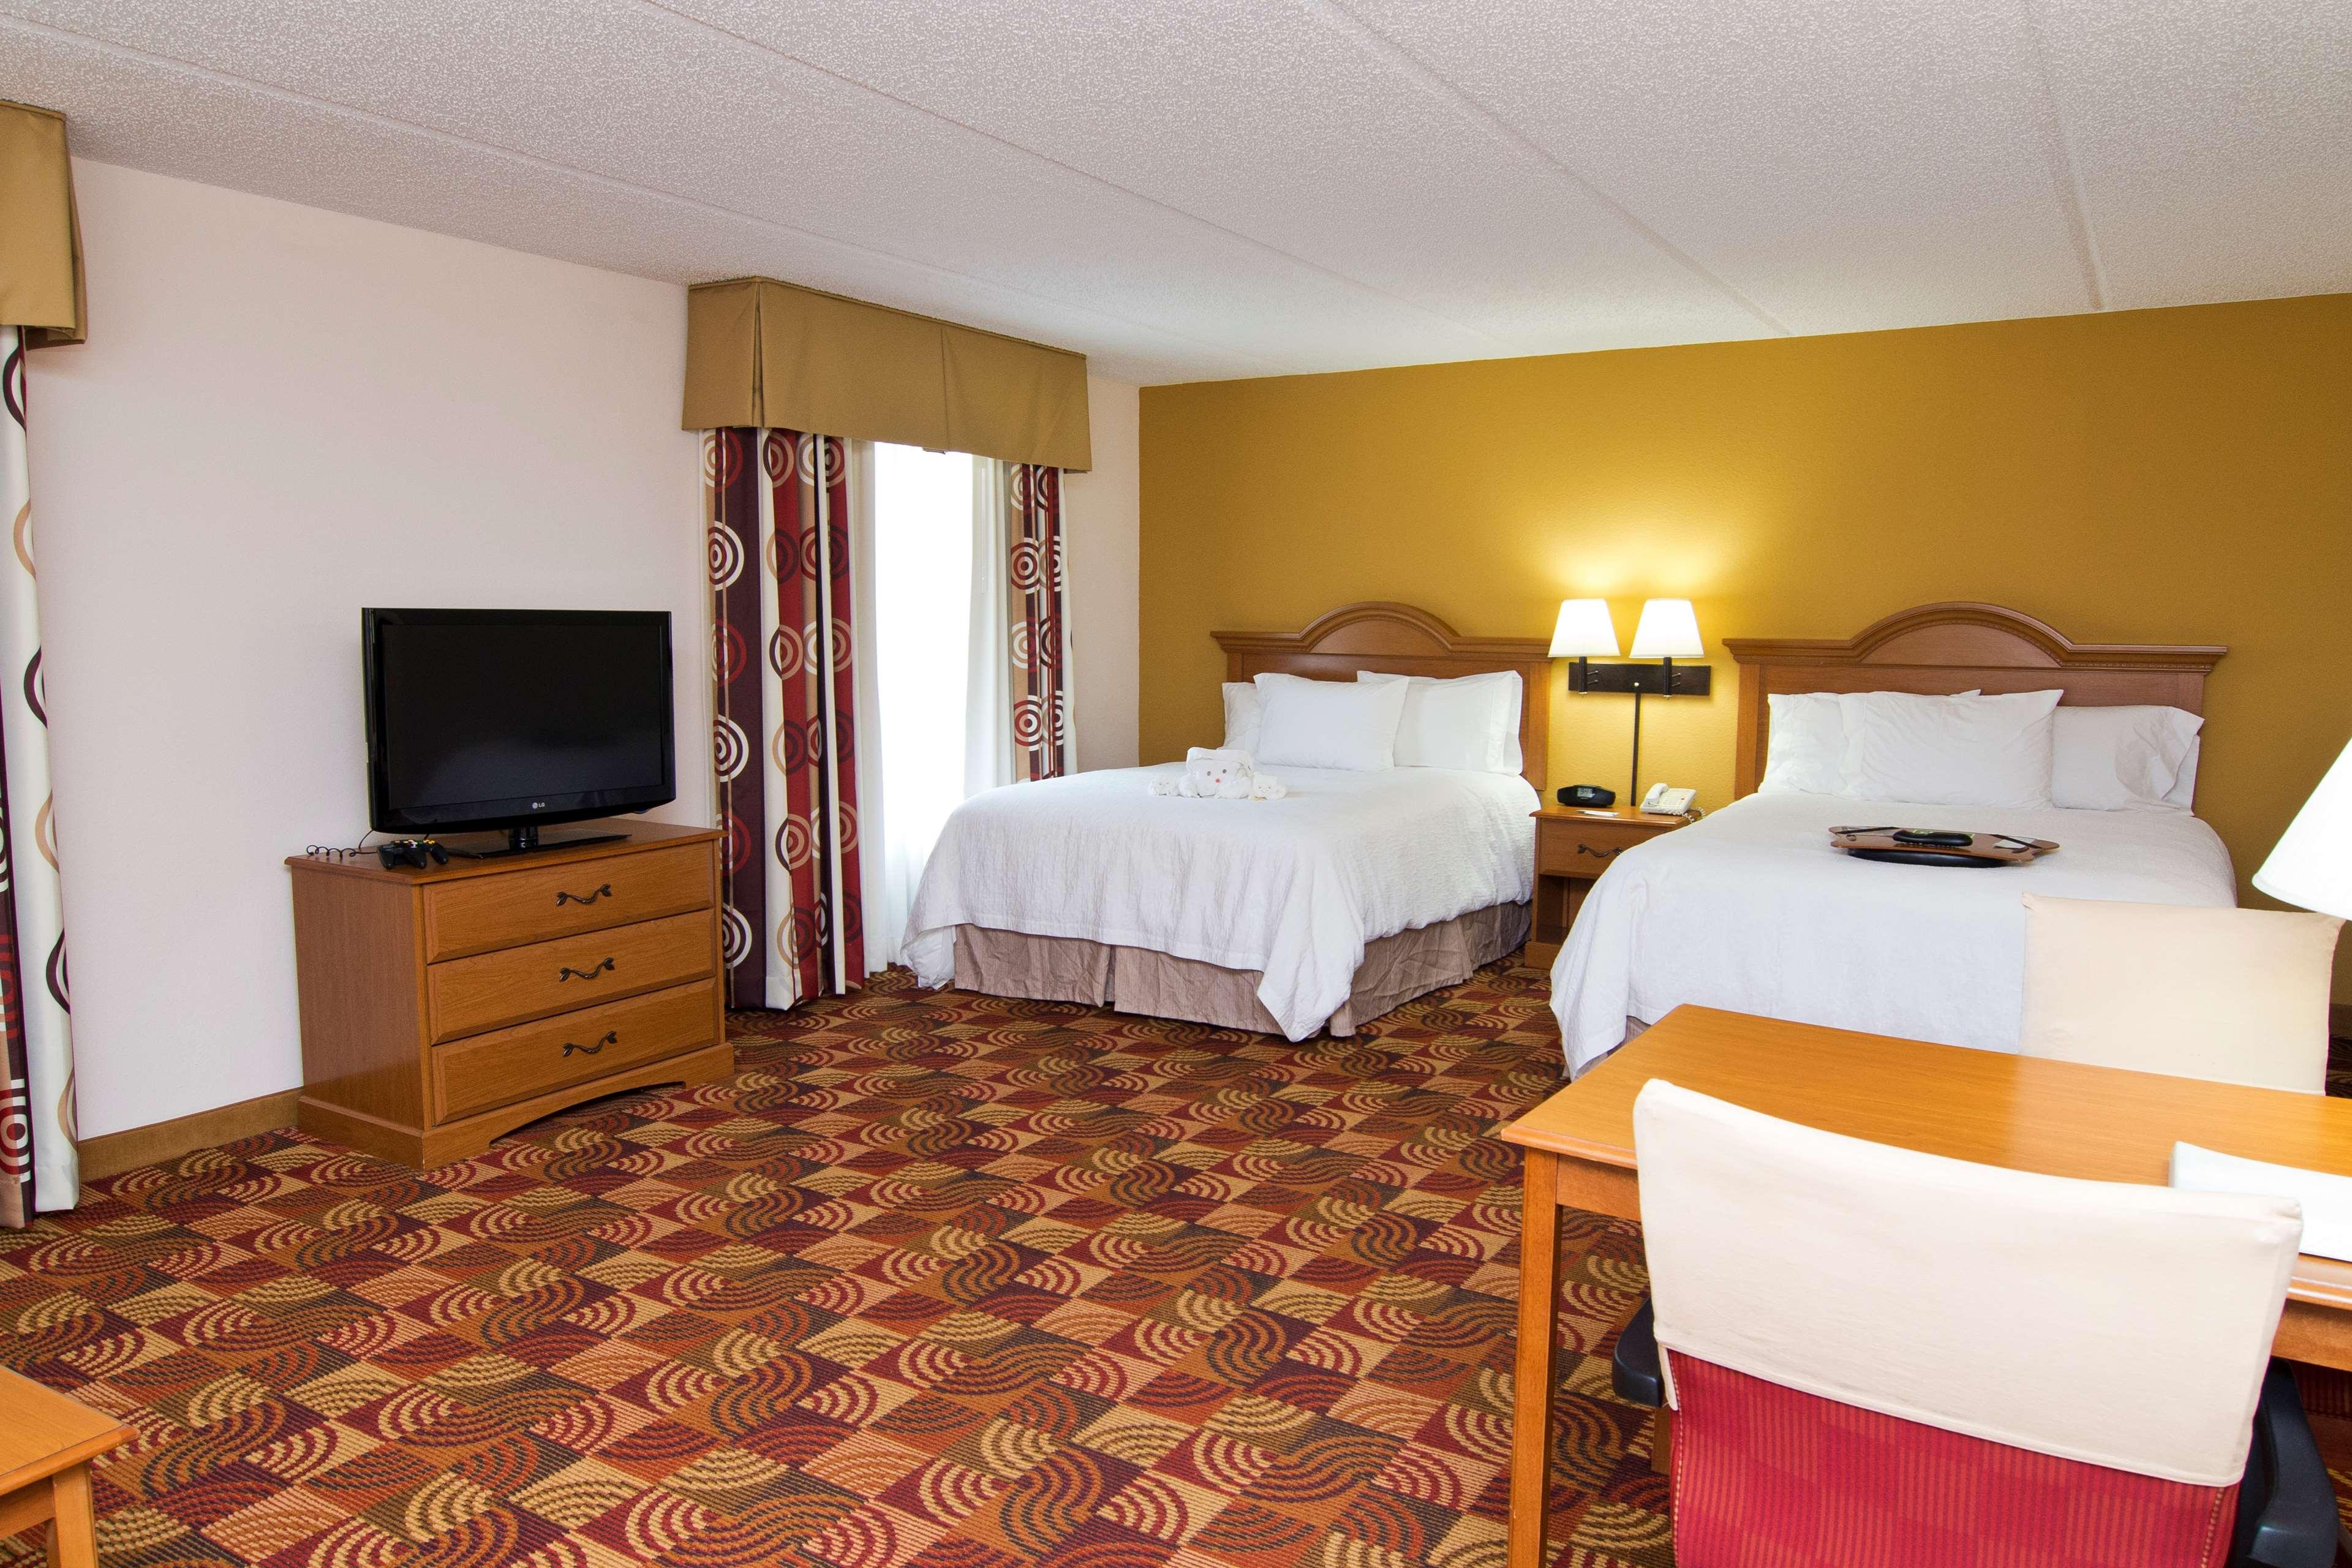 Hampton Inn & Suites Orlando Intl Dr N image 18